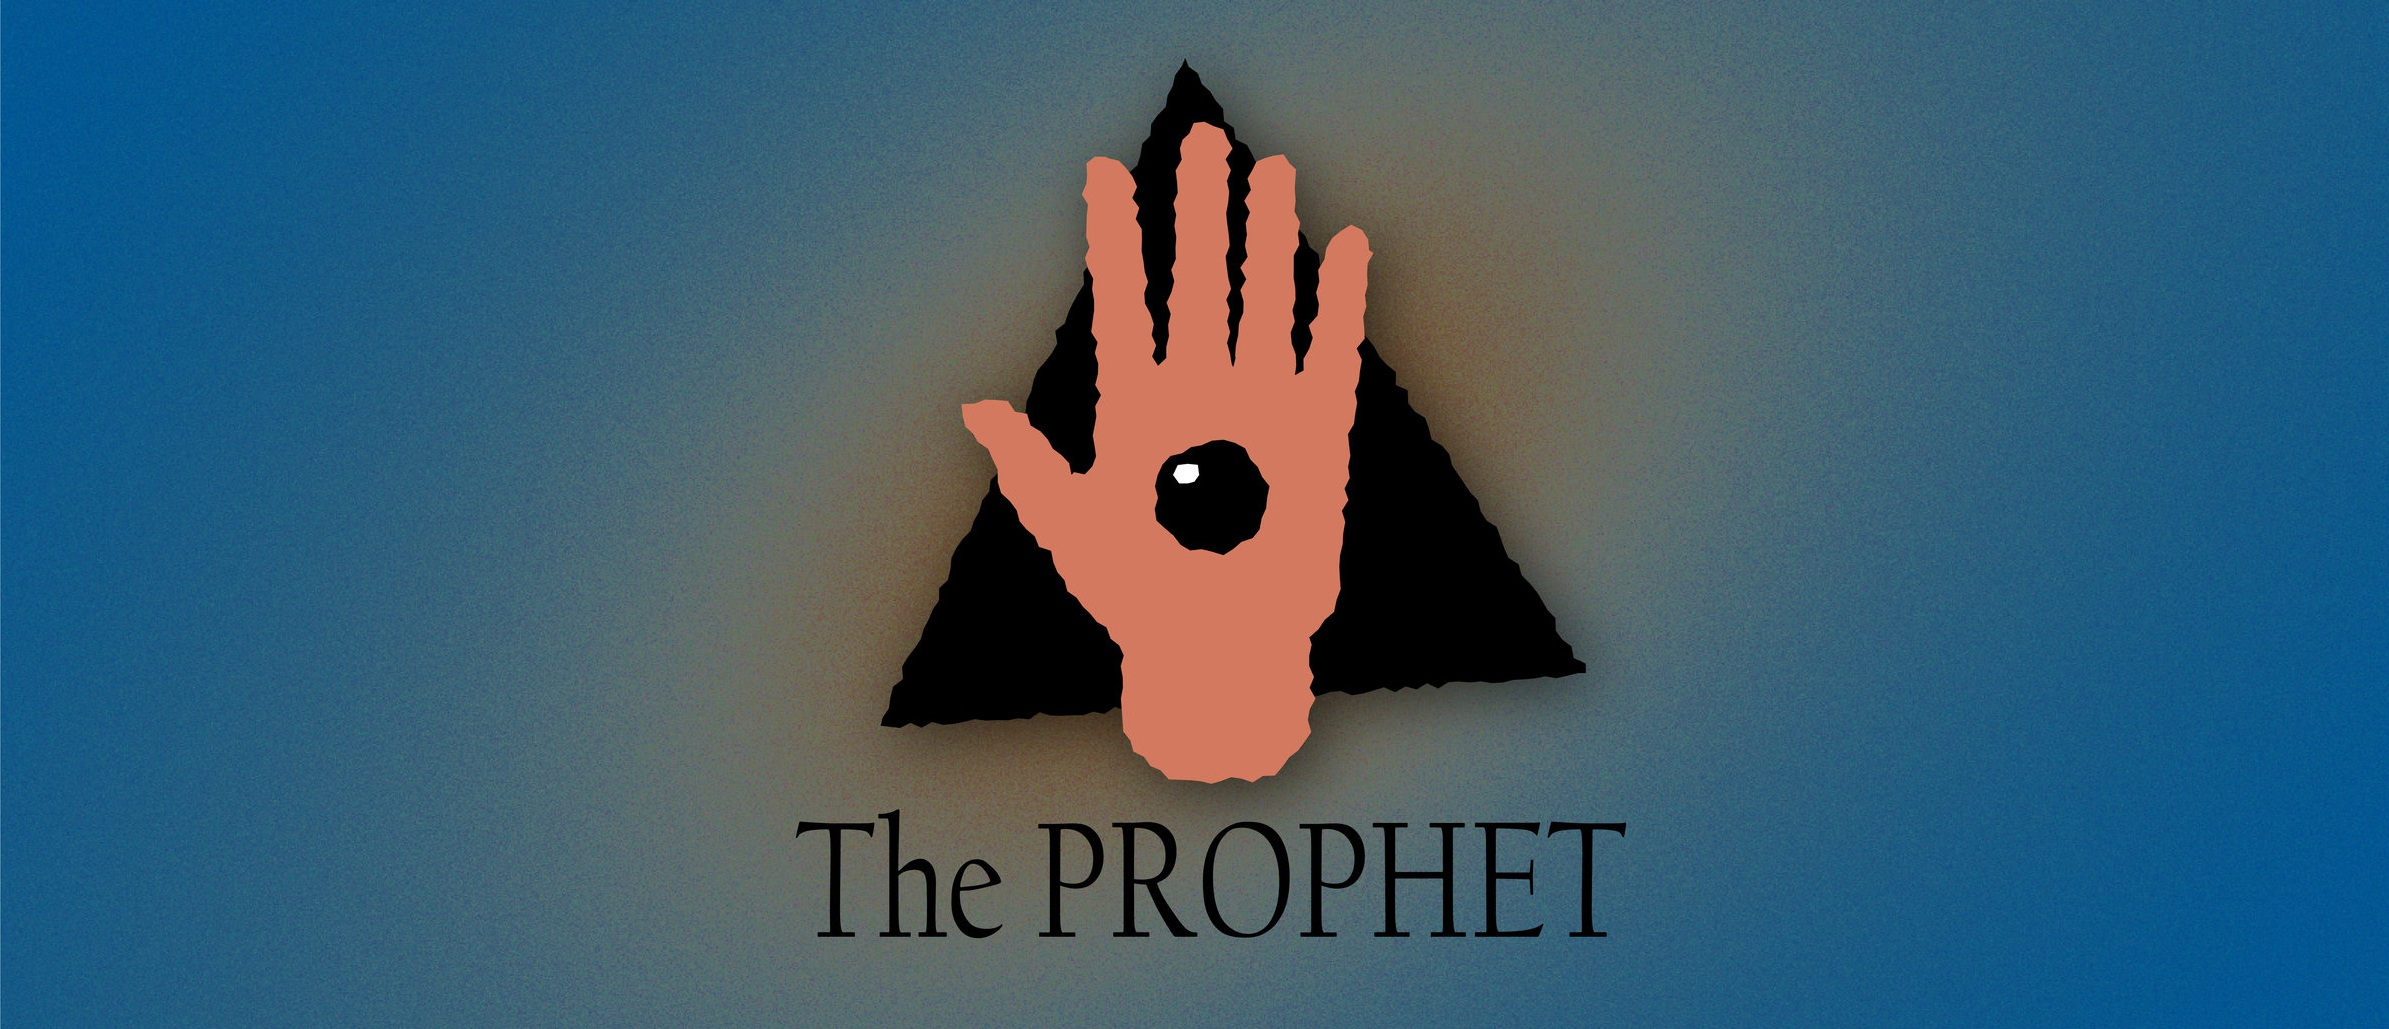 prophetlong.jpg